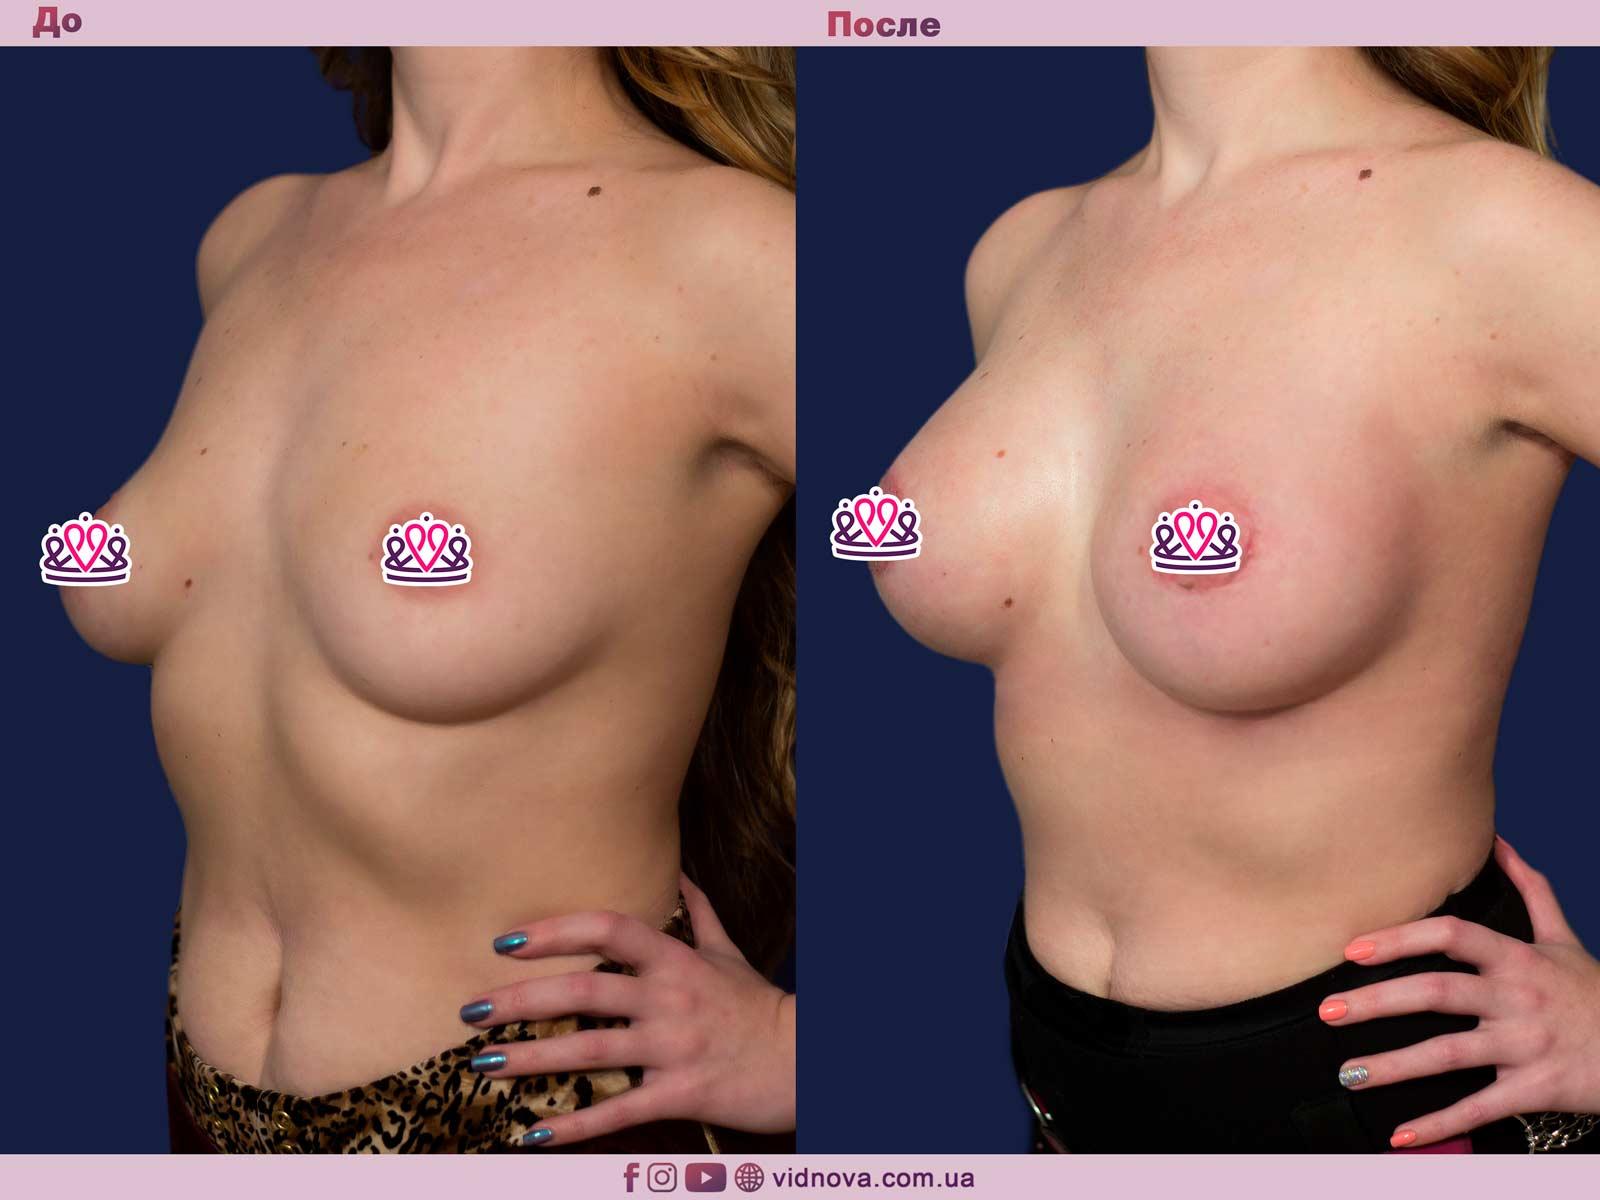 Увеличение груди: Фото ДО и ПОСЛЕ - Пример №77-2 - Клиника Vidnova